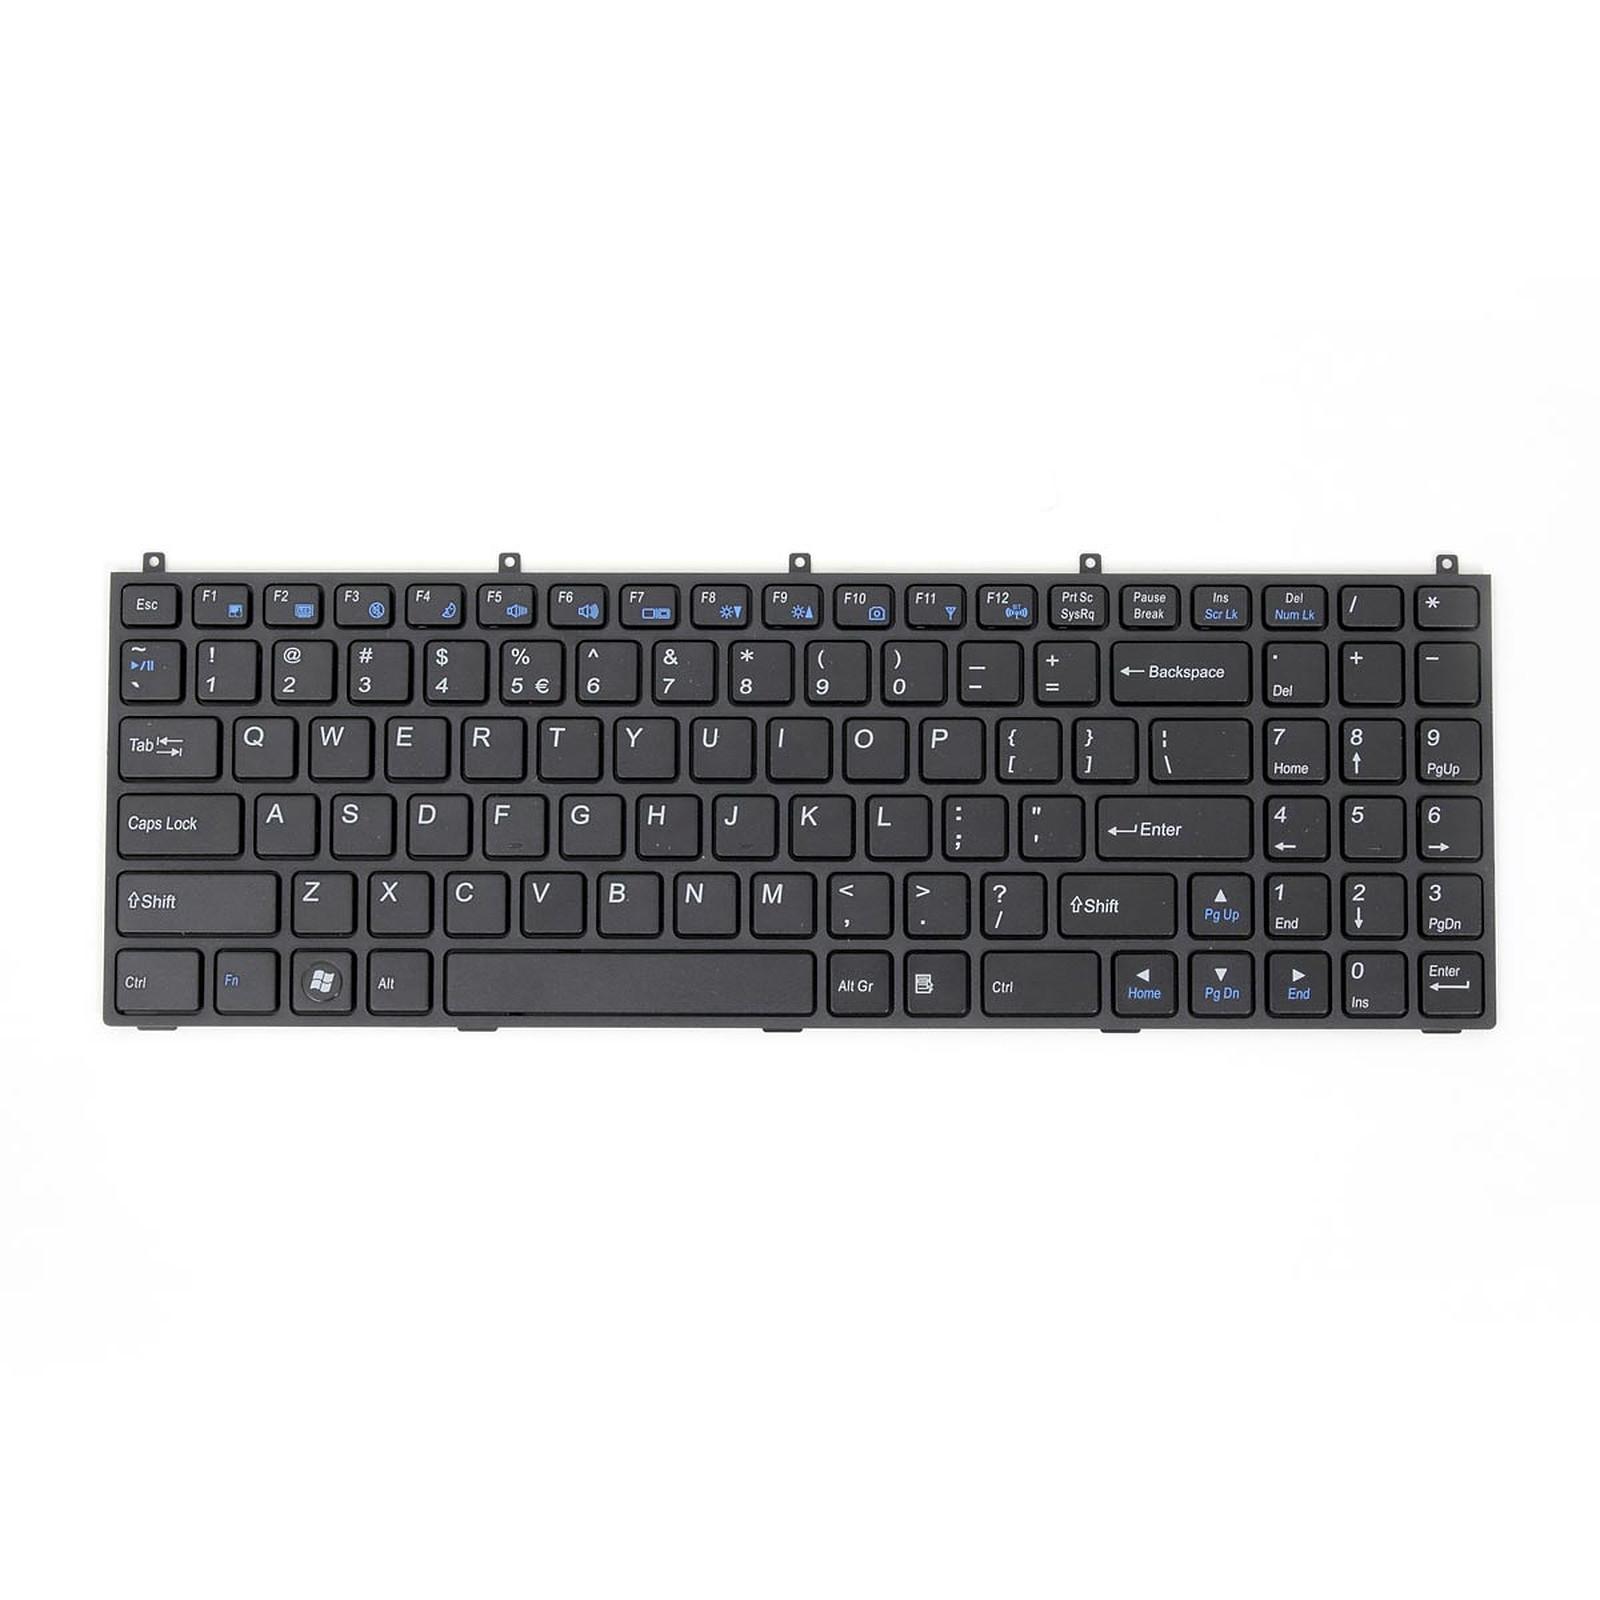 Clavier pour PC portable LDLC Aurore BB3/BB4/BG3/BG4 et Saturne SB3/SB4/SB5 (USA)